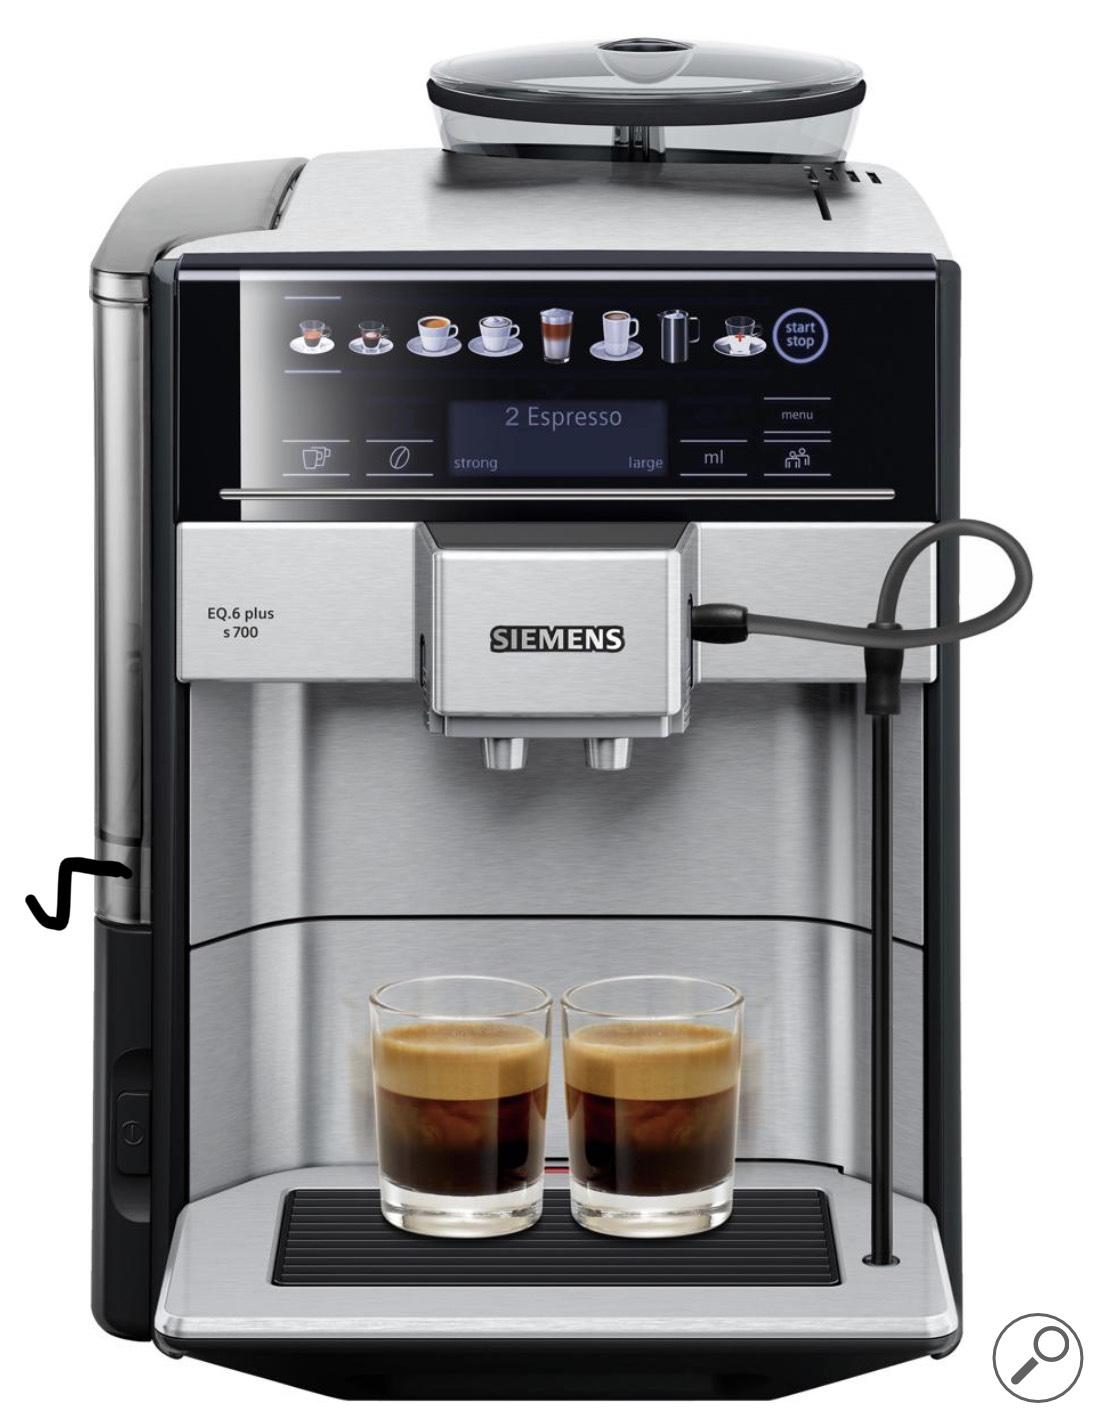 Siemens TE657313RW EQ6 Plus - Espressomachine Volautomaat - RVS (excl €50 cashback)